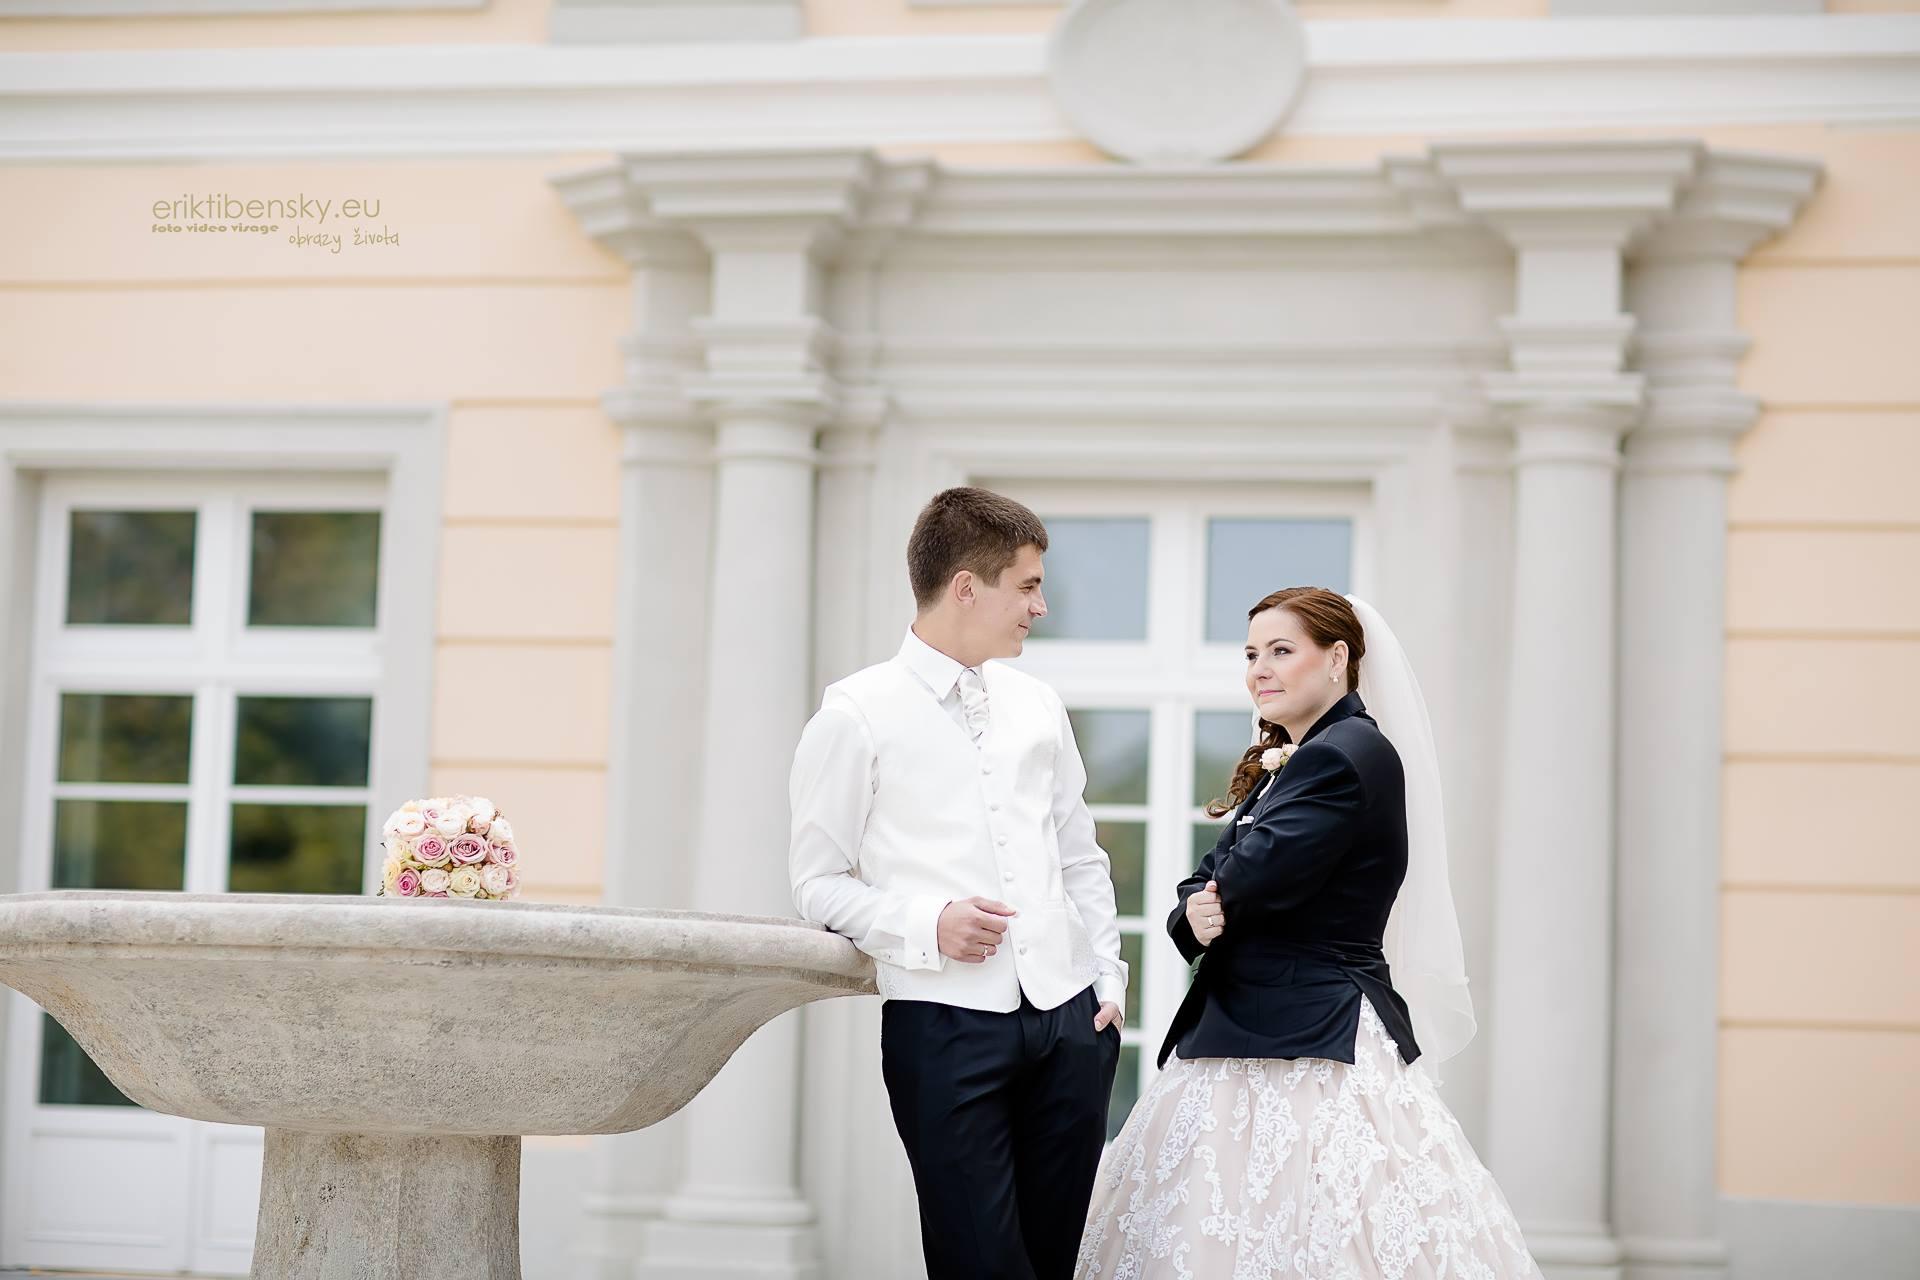 eriktibensky-eu-svadobny-fotograf-wedding-photographer-3077